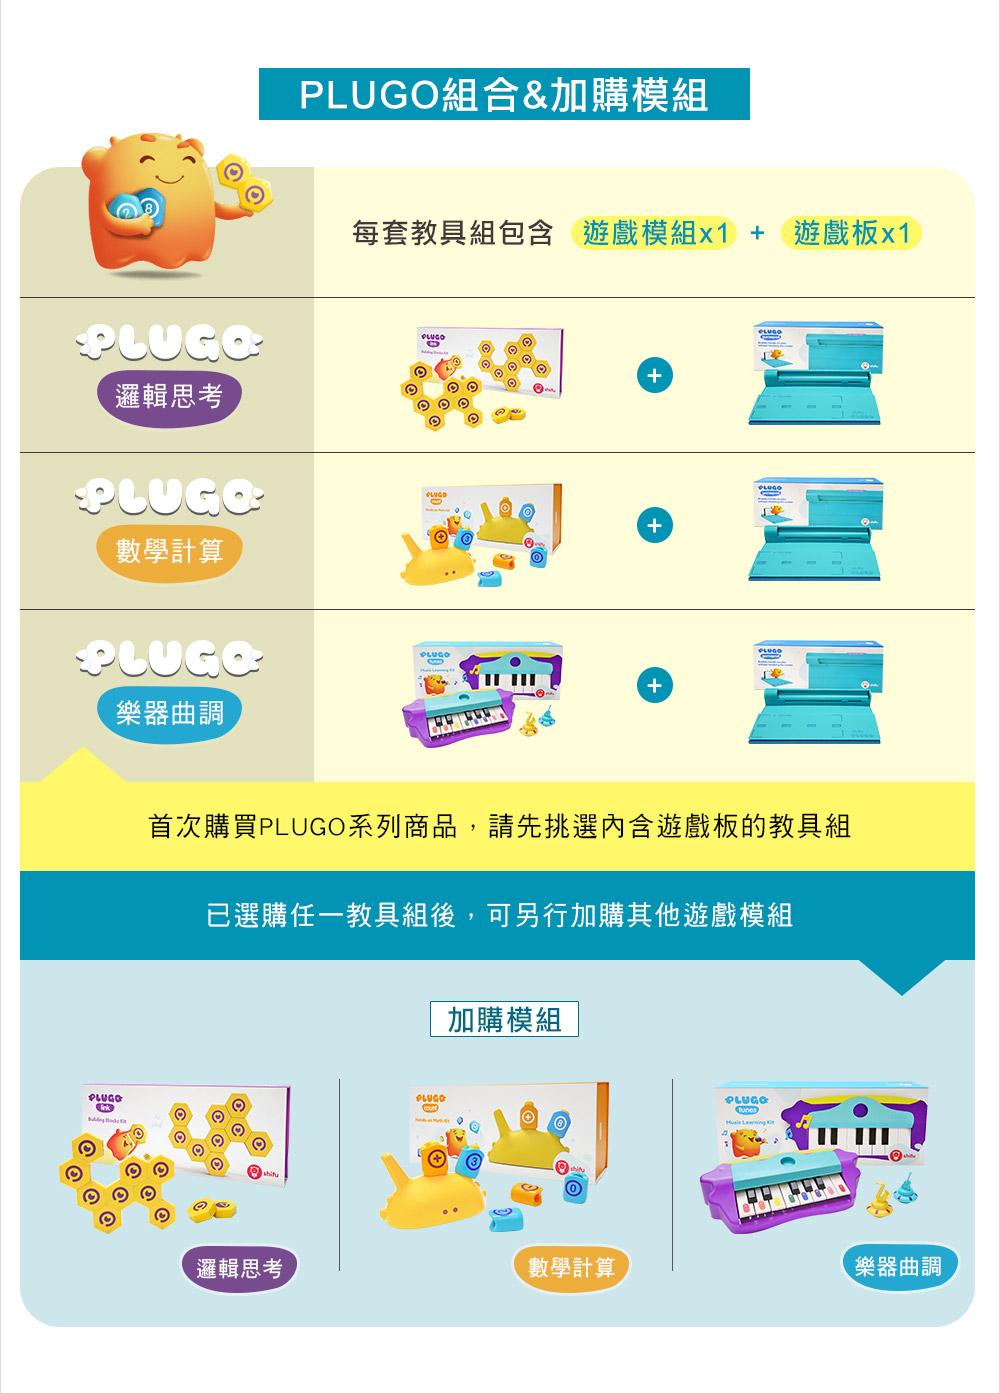 【shifu】PLUGO組合商品、加購模組介紹